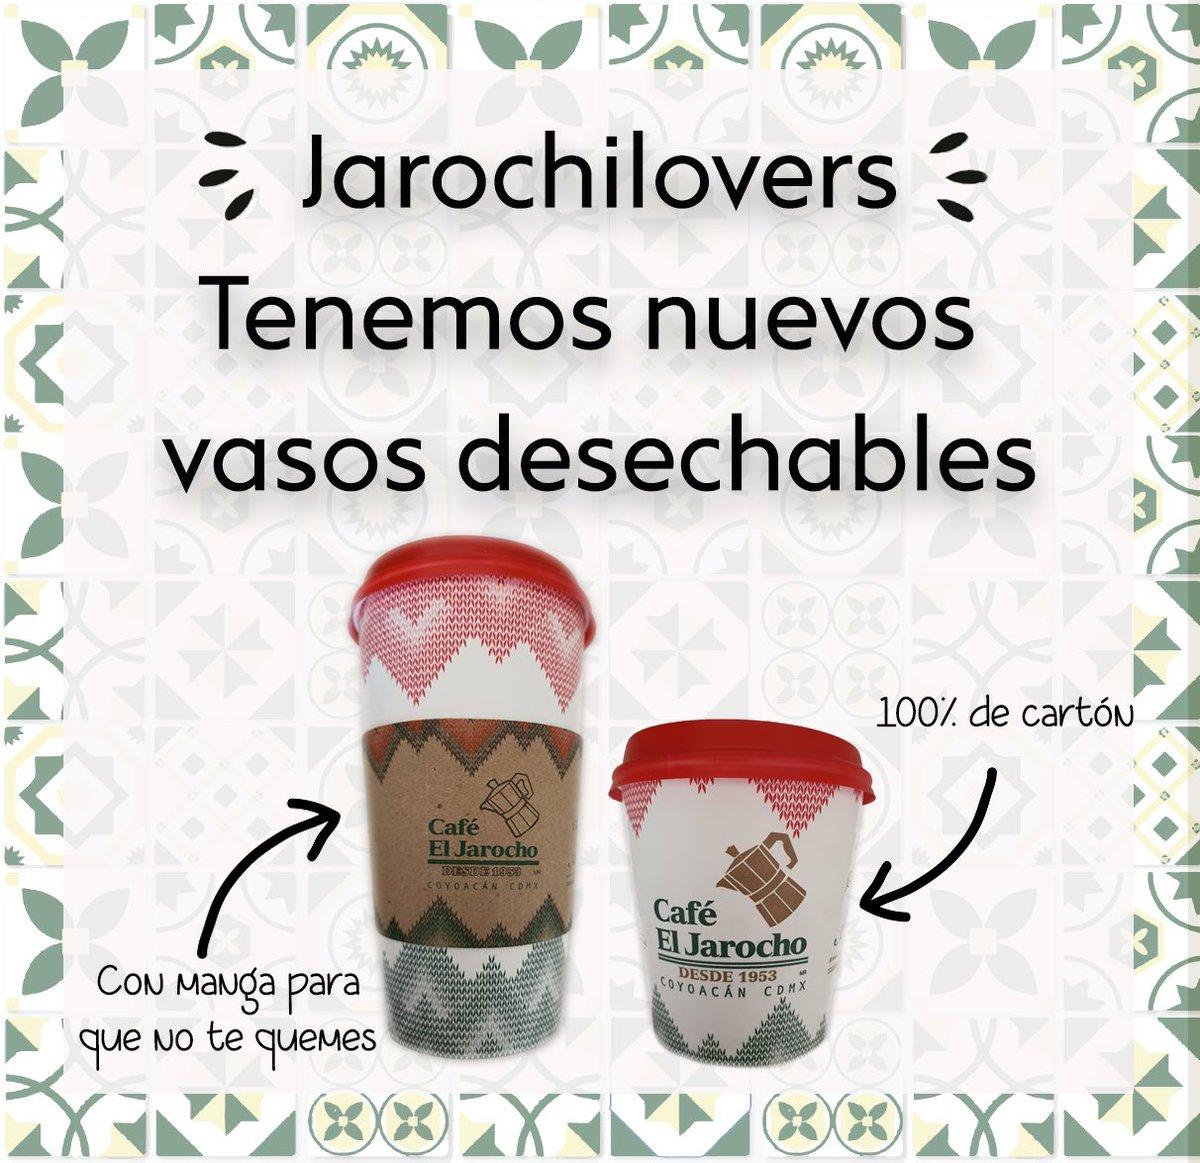 #ecofriendly #elaromadecoyoacan #cafeparallevar #cafe #coyoacan #cafeeljarochopic.twitter.com/h2Ckwyqg0k